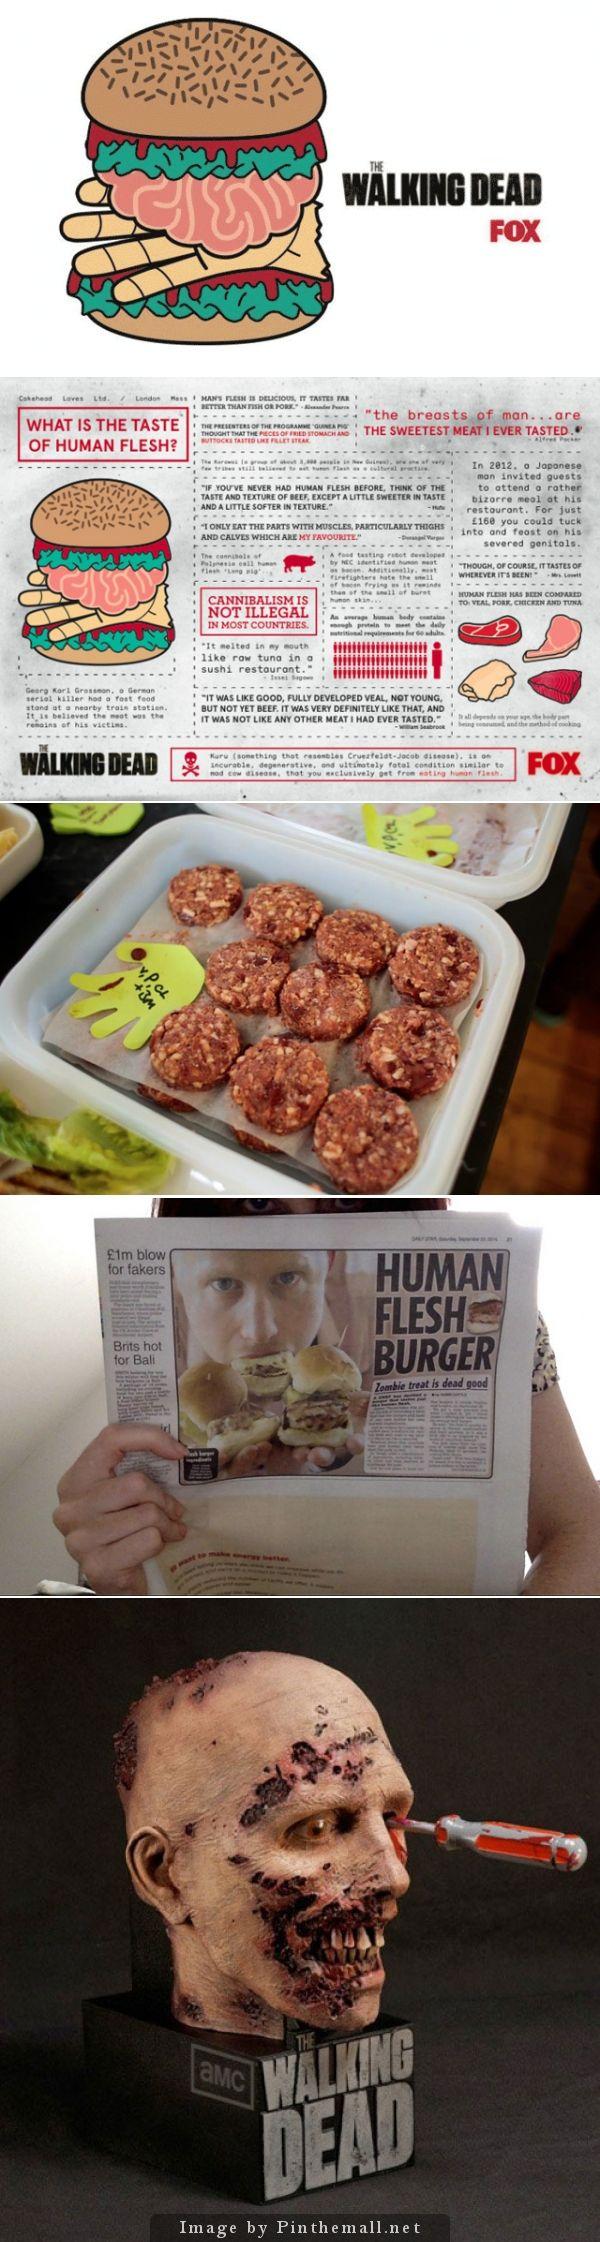 The Walking Dead 5 Human Hamburger by London Mess / Miss Cakehead | Unconventional Fox Tv